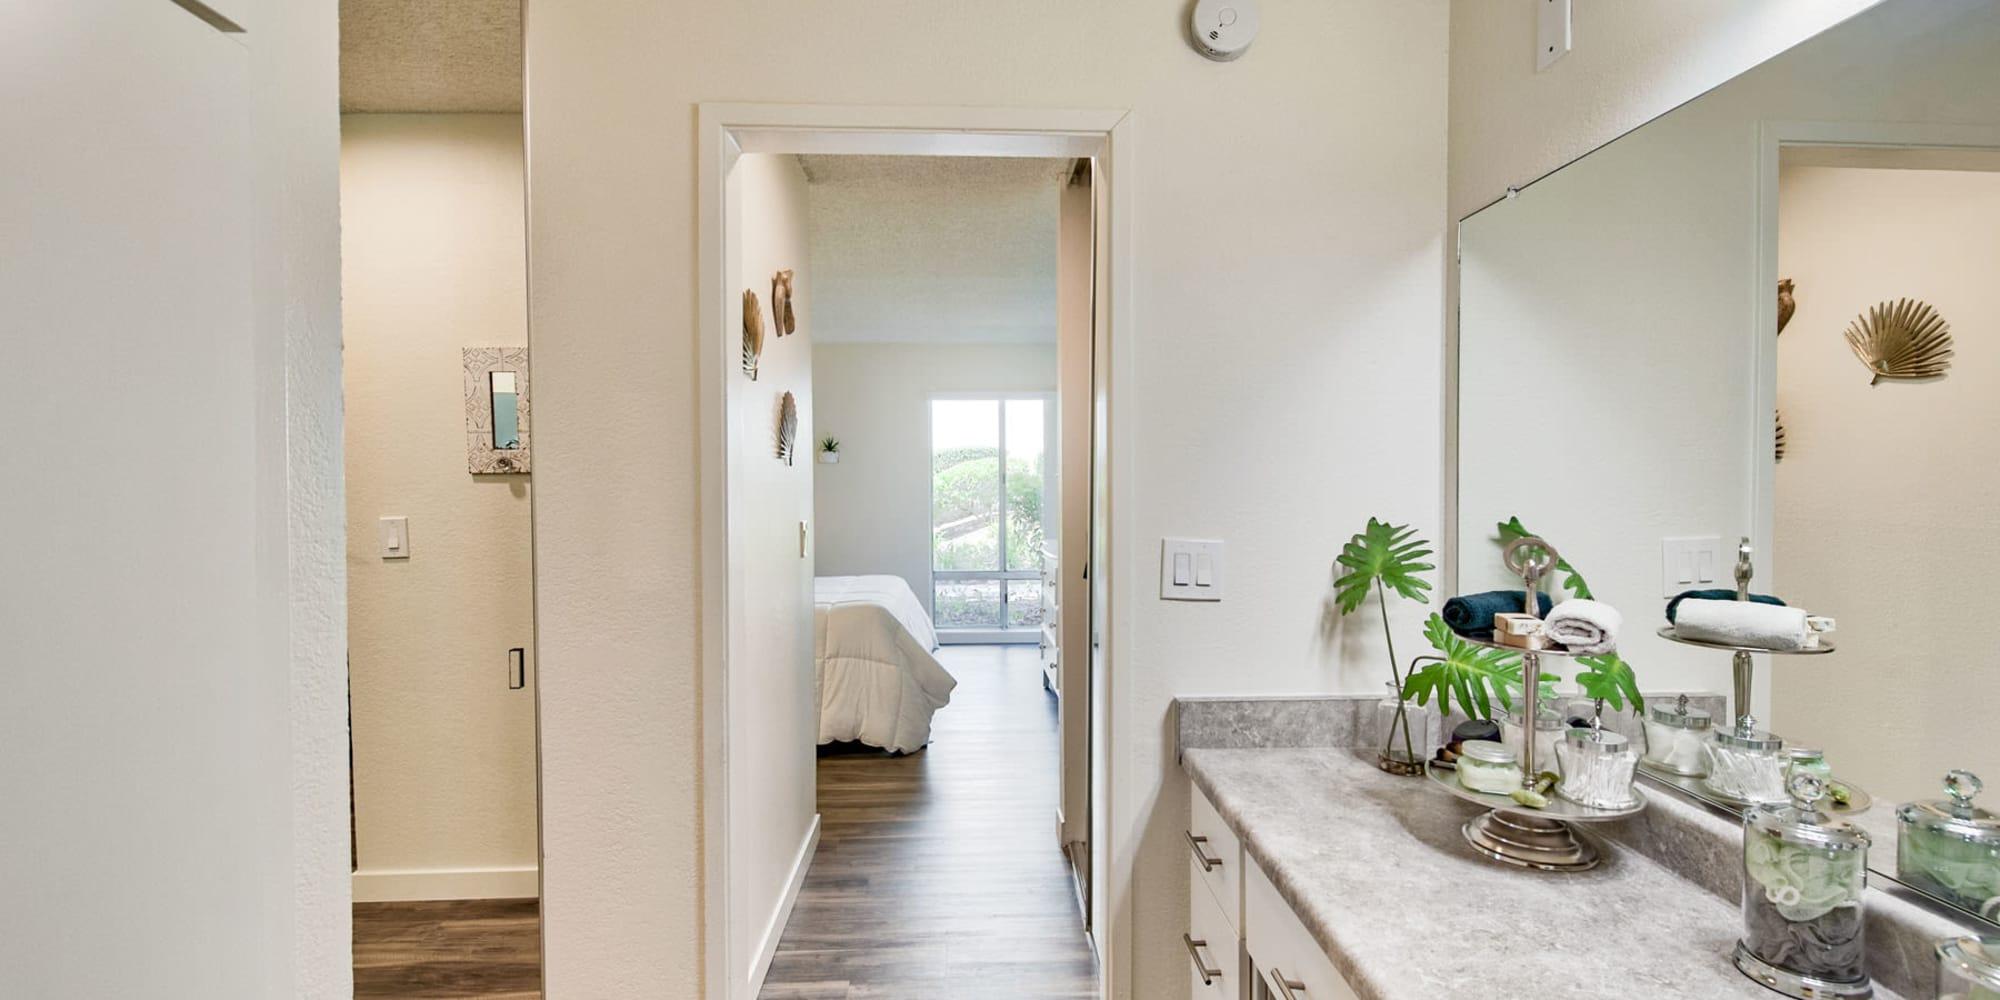 Hardwood flooring throughout a model home's primary bedroom and en suite bathroom at Mediterranean Village Apartments in Costa Mesa, California